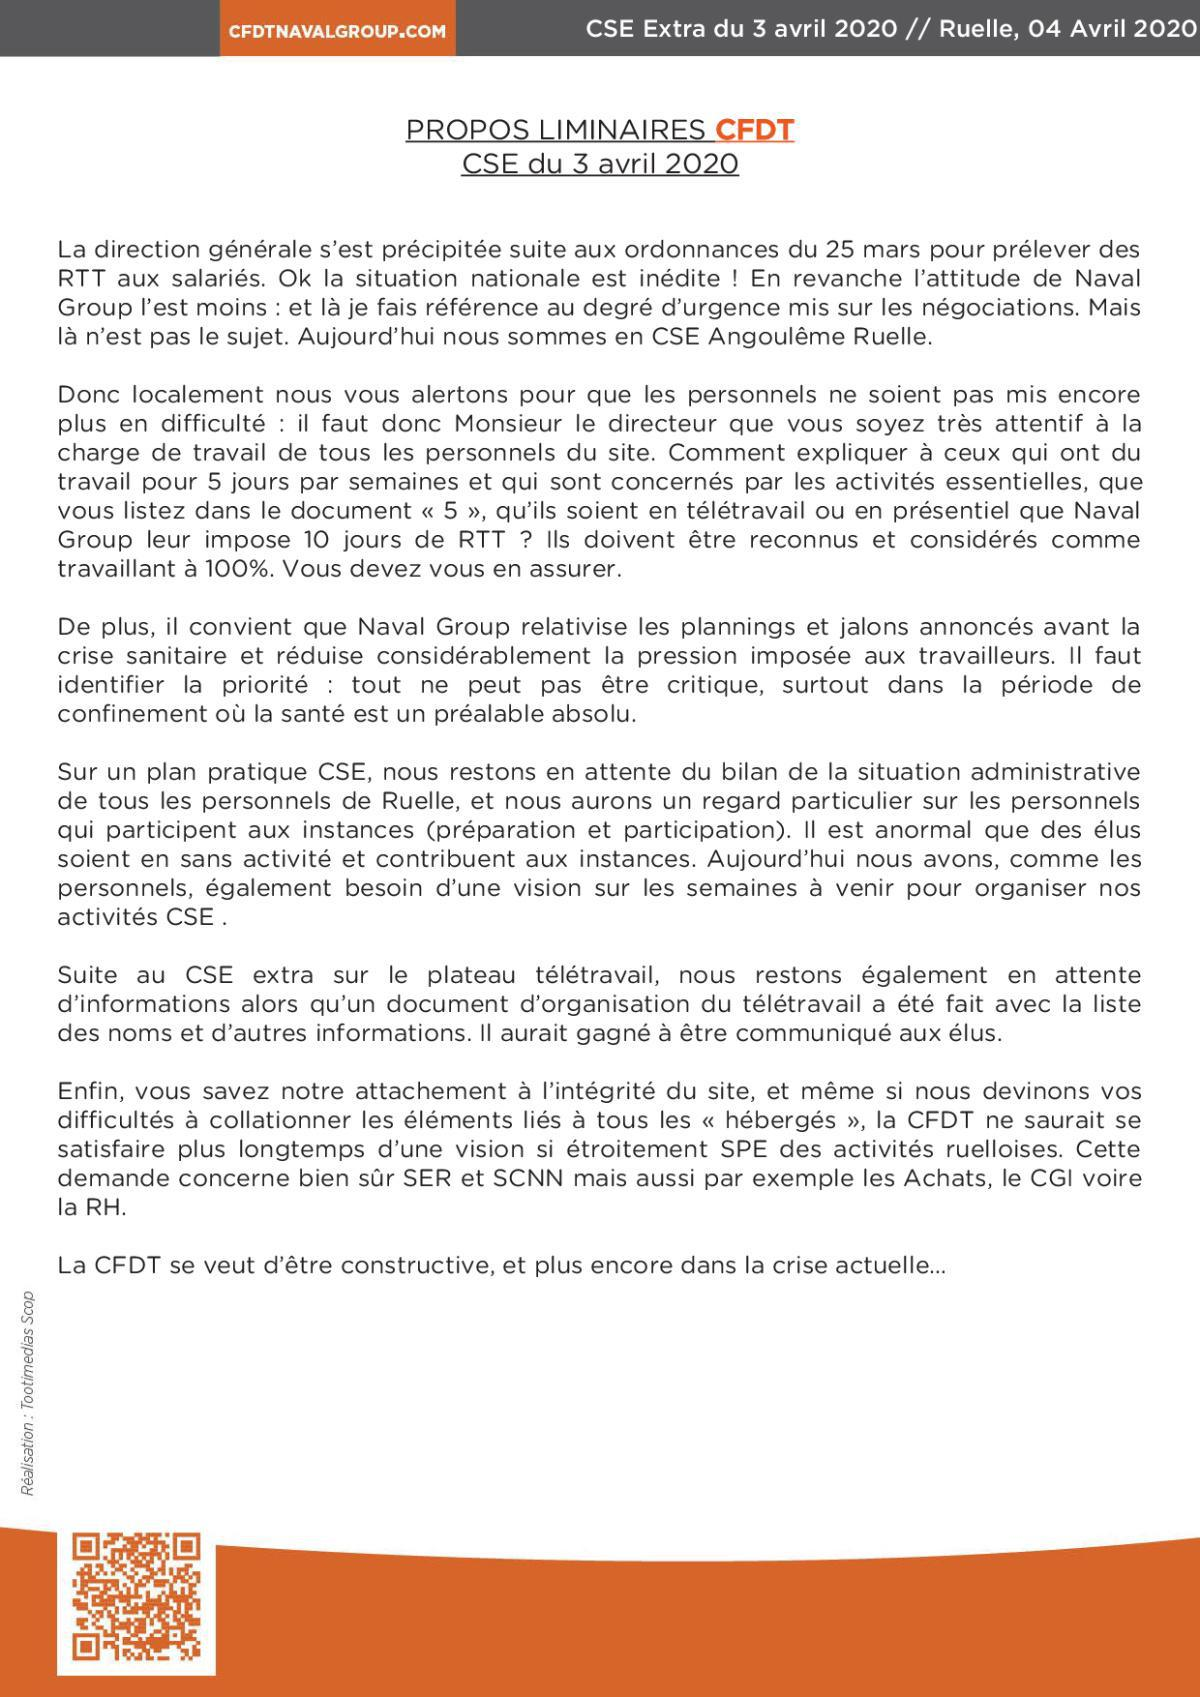 CR CSE extra de Ruelle du 03 avril 2020